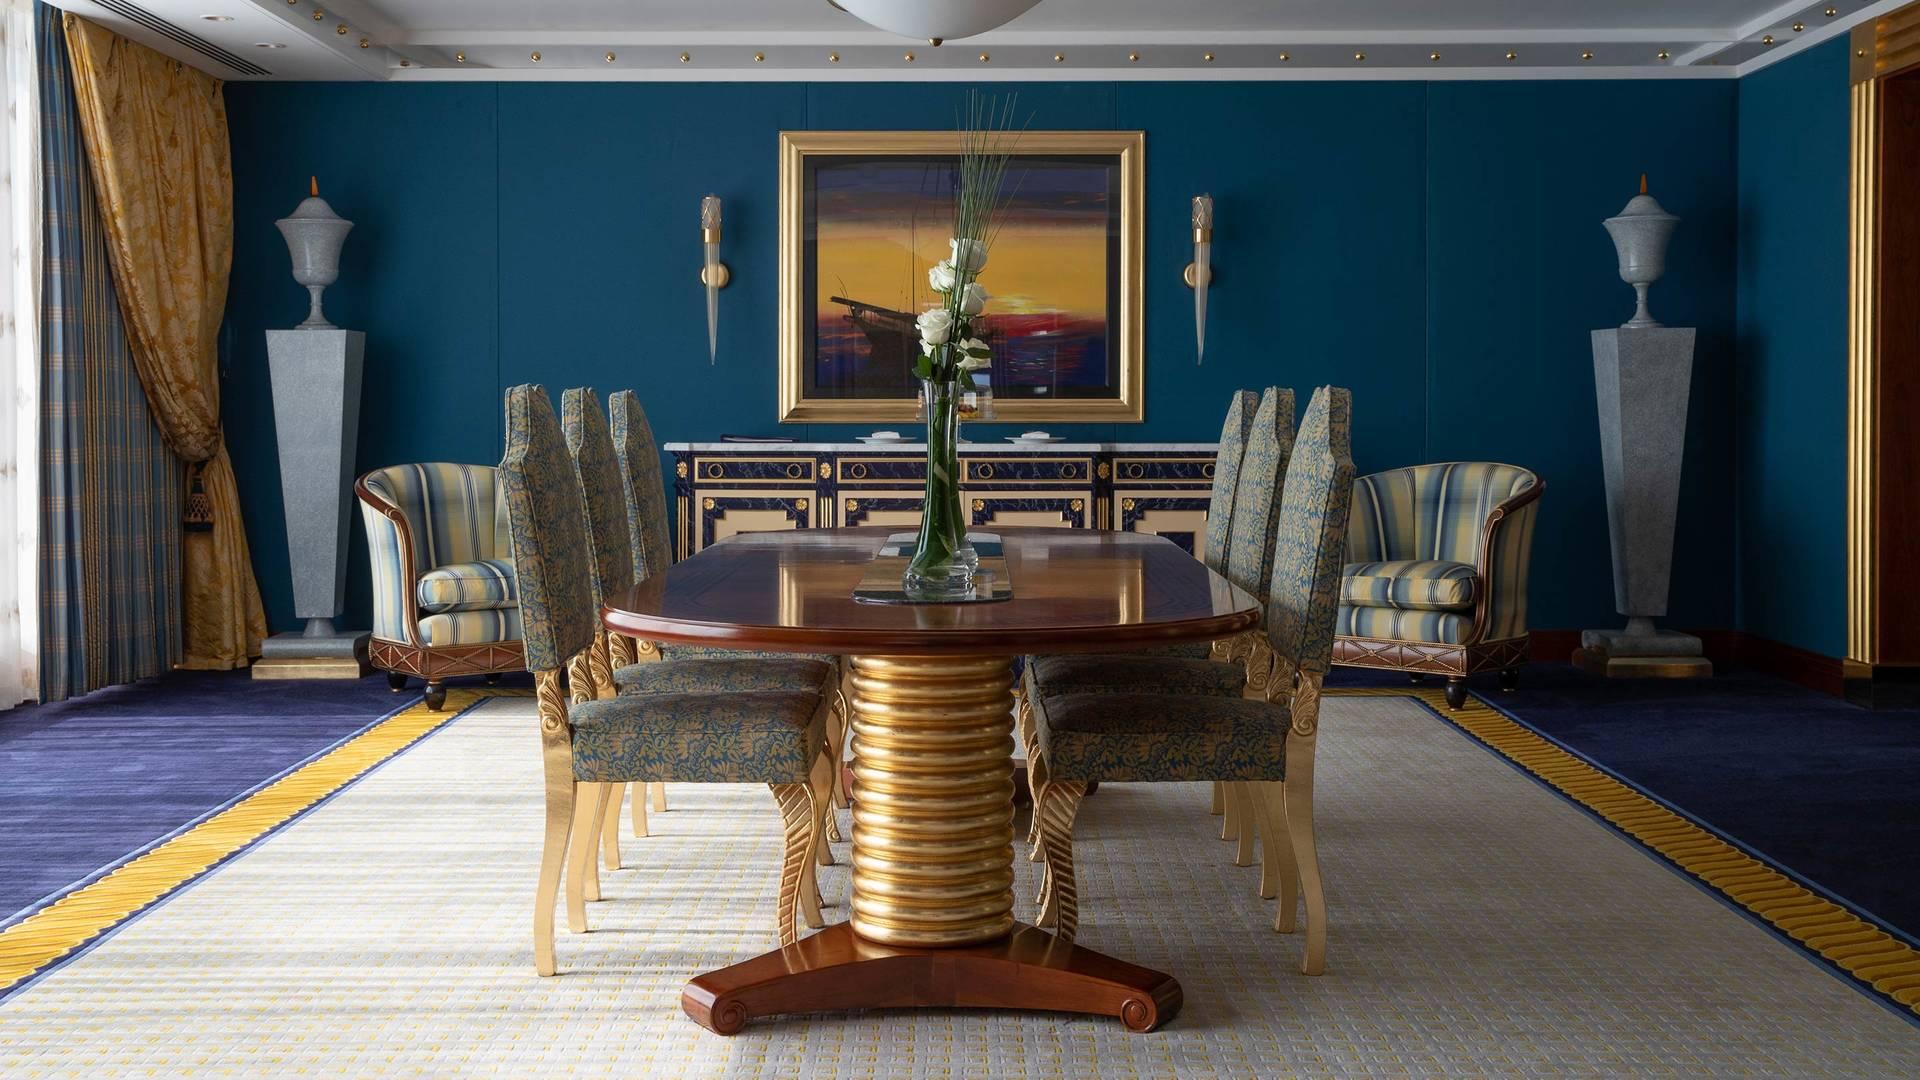 Jumeirah Burj Al Arab Presidential suite dining room_16-9